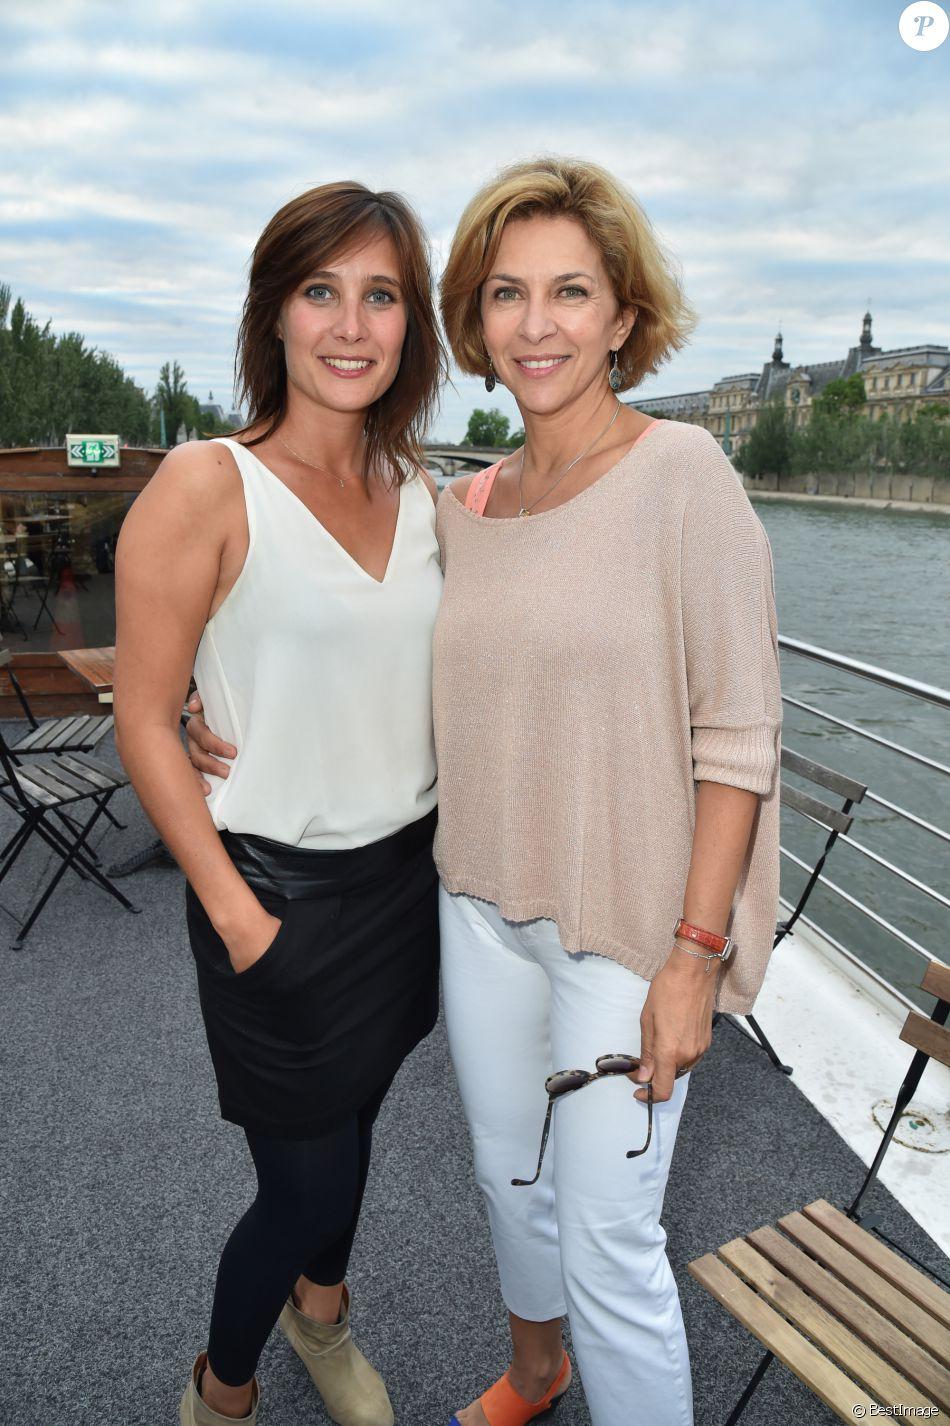 Corinne touzet vie priv e - Sonia mabrouk mariee biographie ...